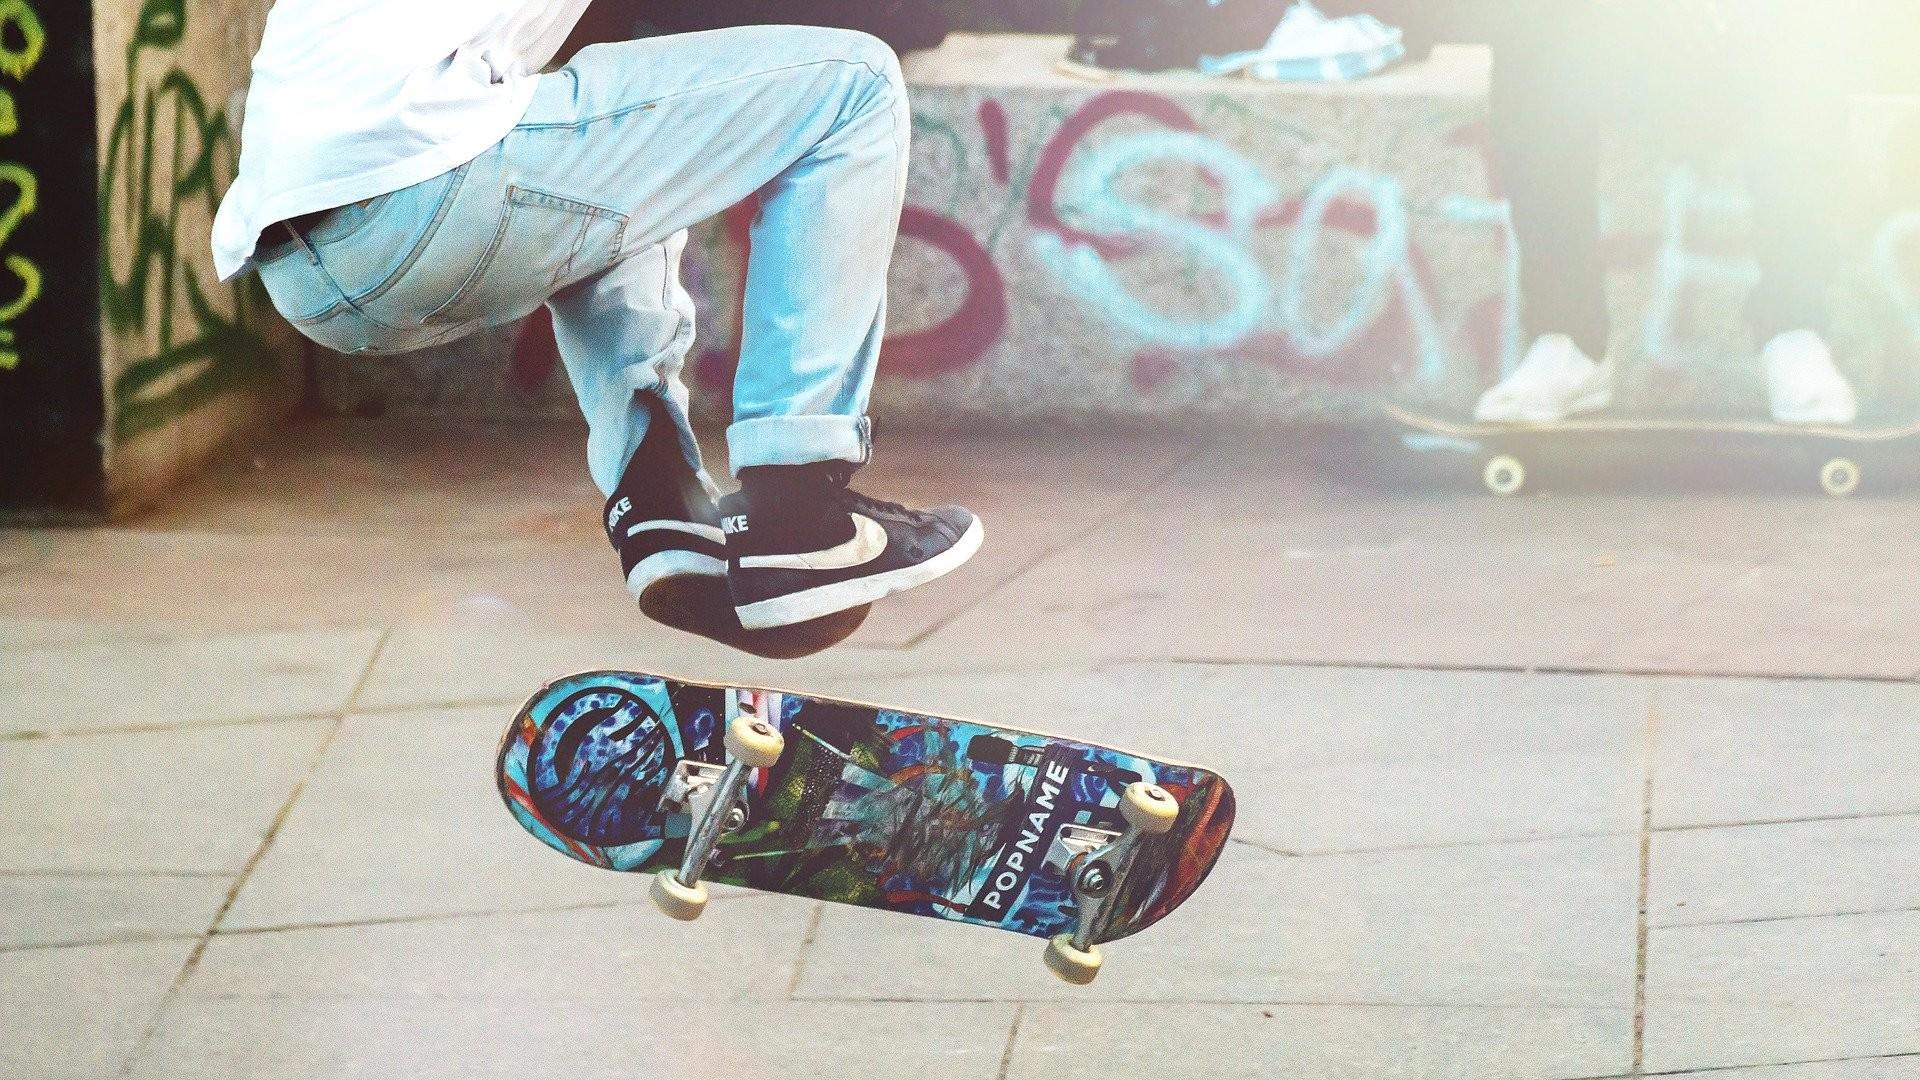 Skateboarder with graffiti background